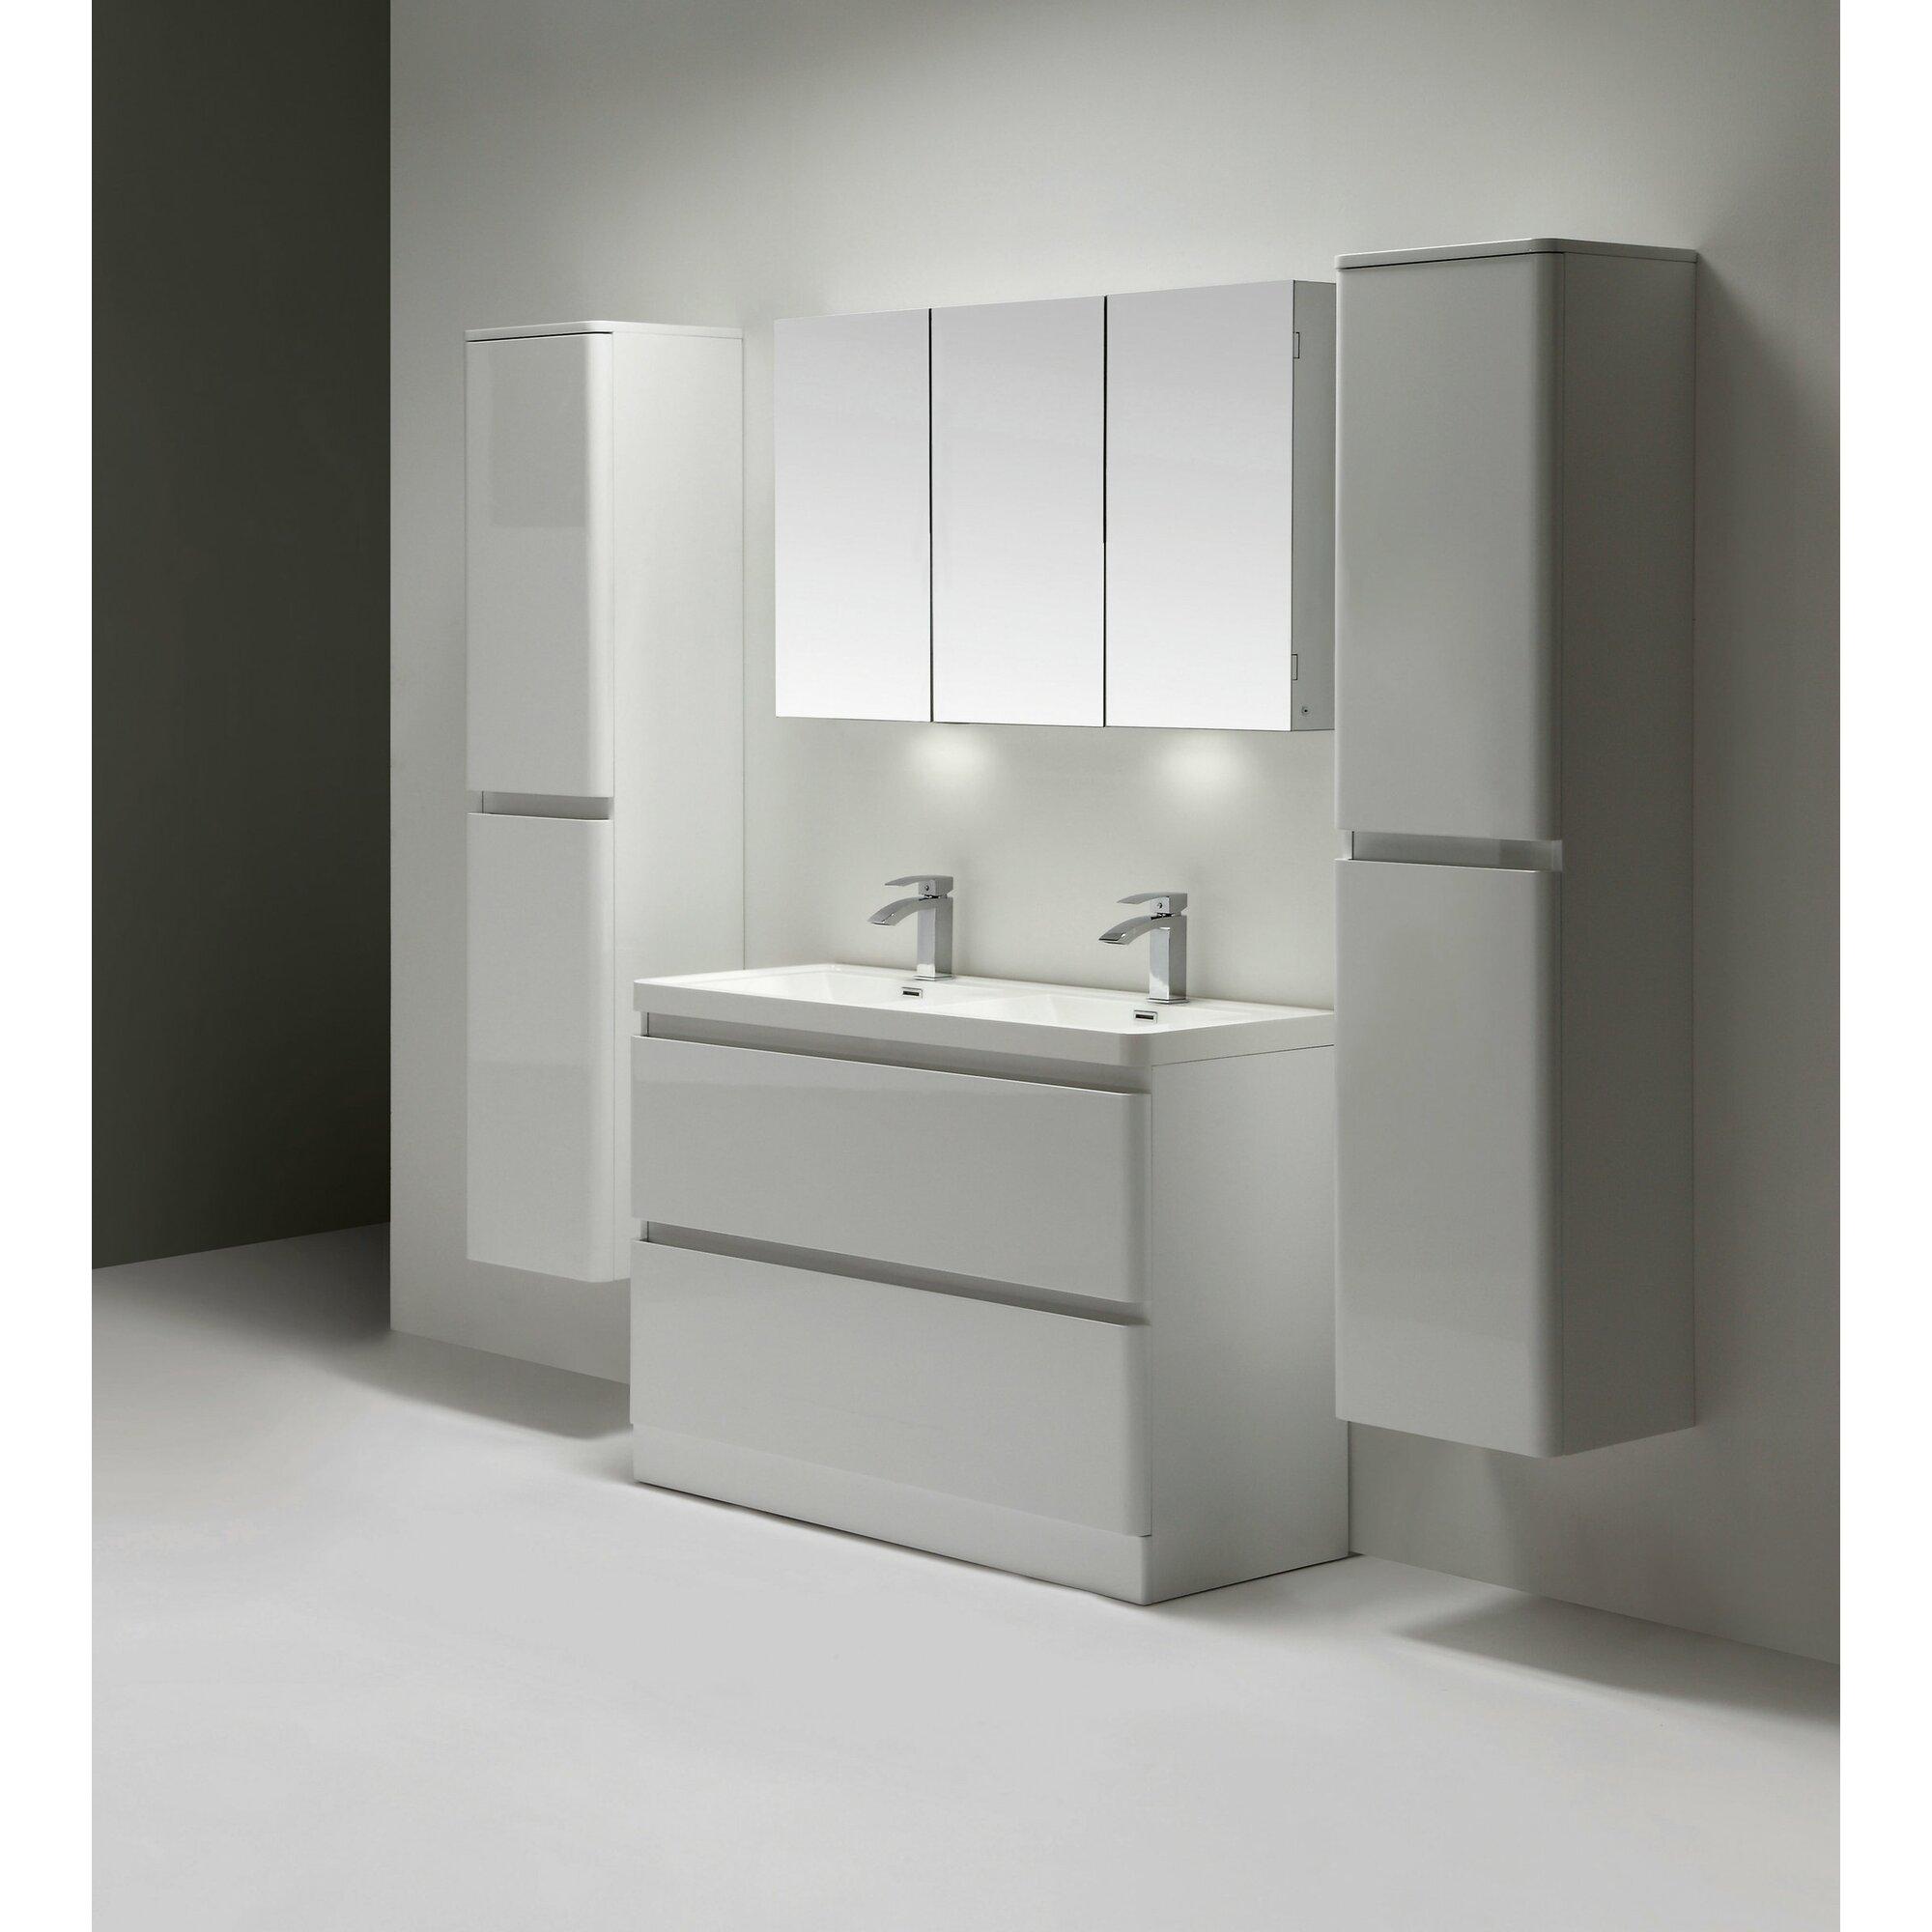 Double bathroom vanity - Glazzy 48 Double Bathroom Vanity Set